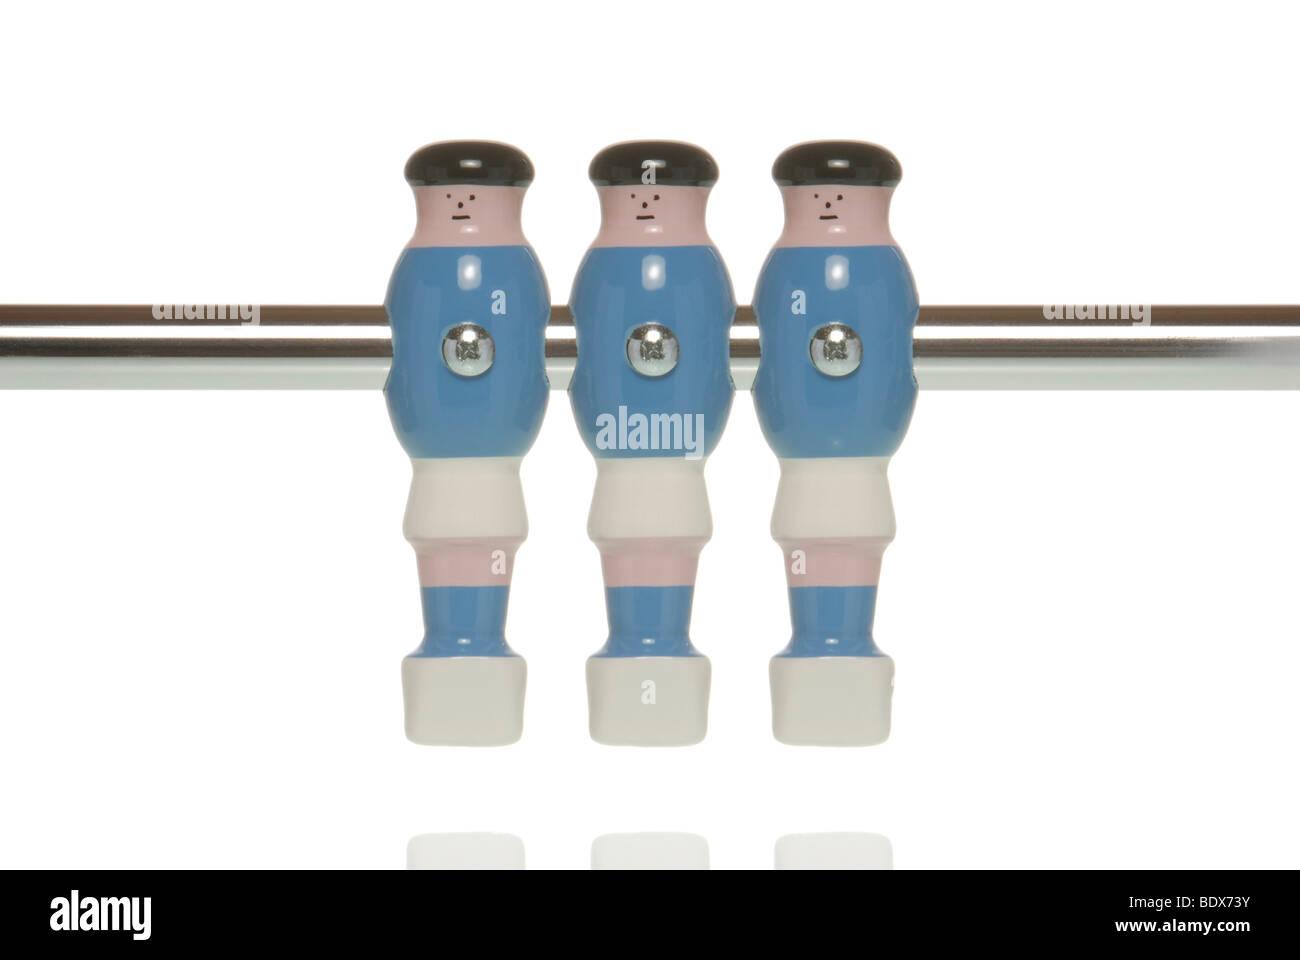 Three tabletop football figures, foosball, tabletop soccer - Stock Image